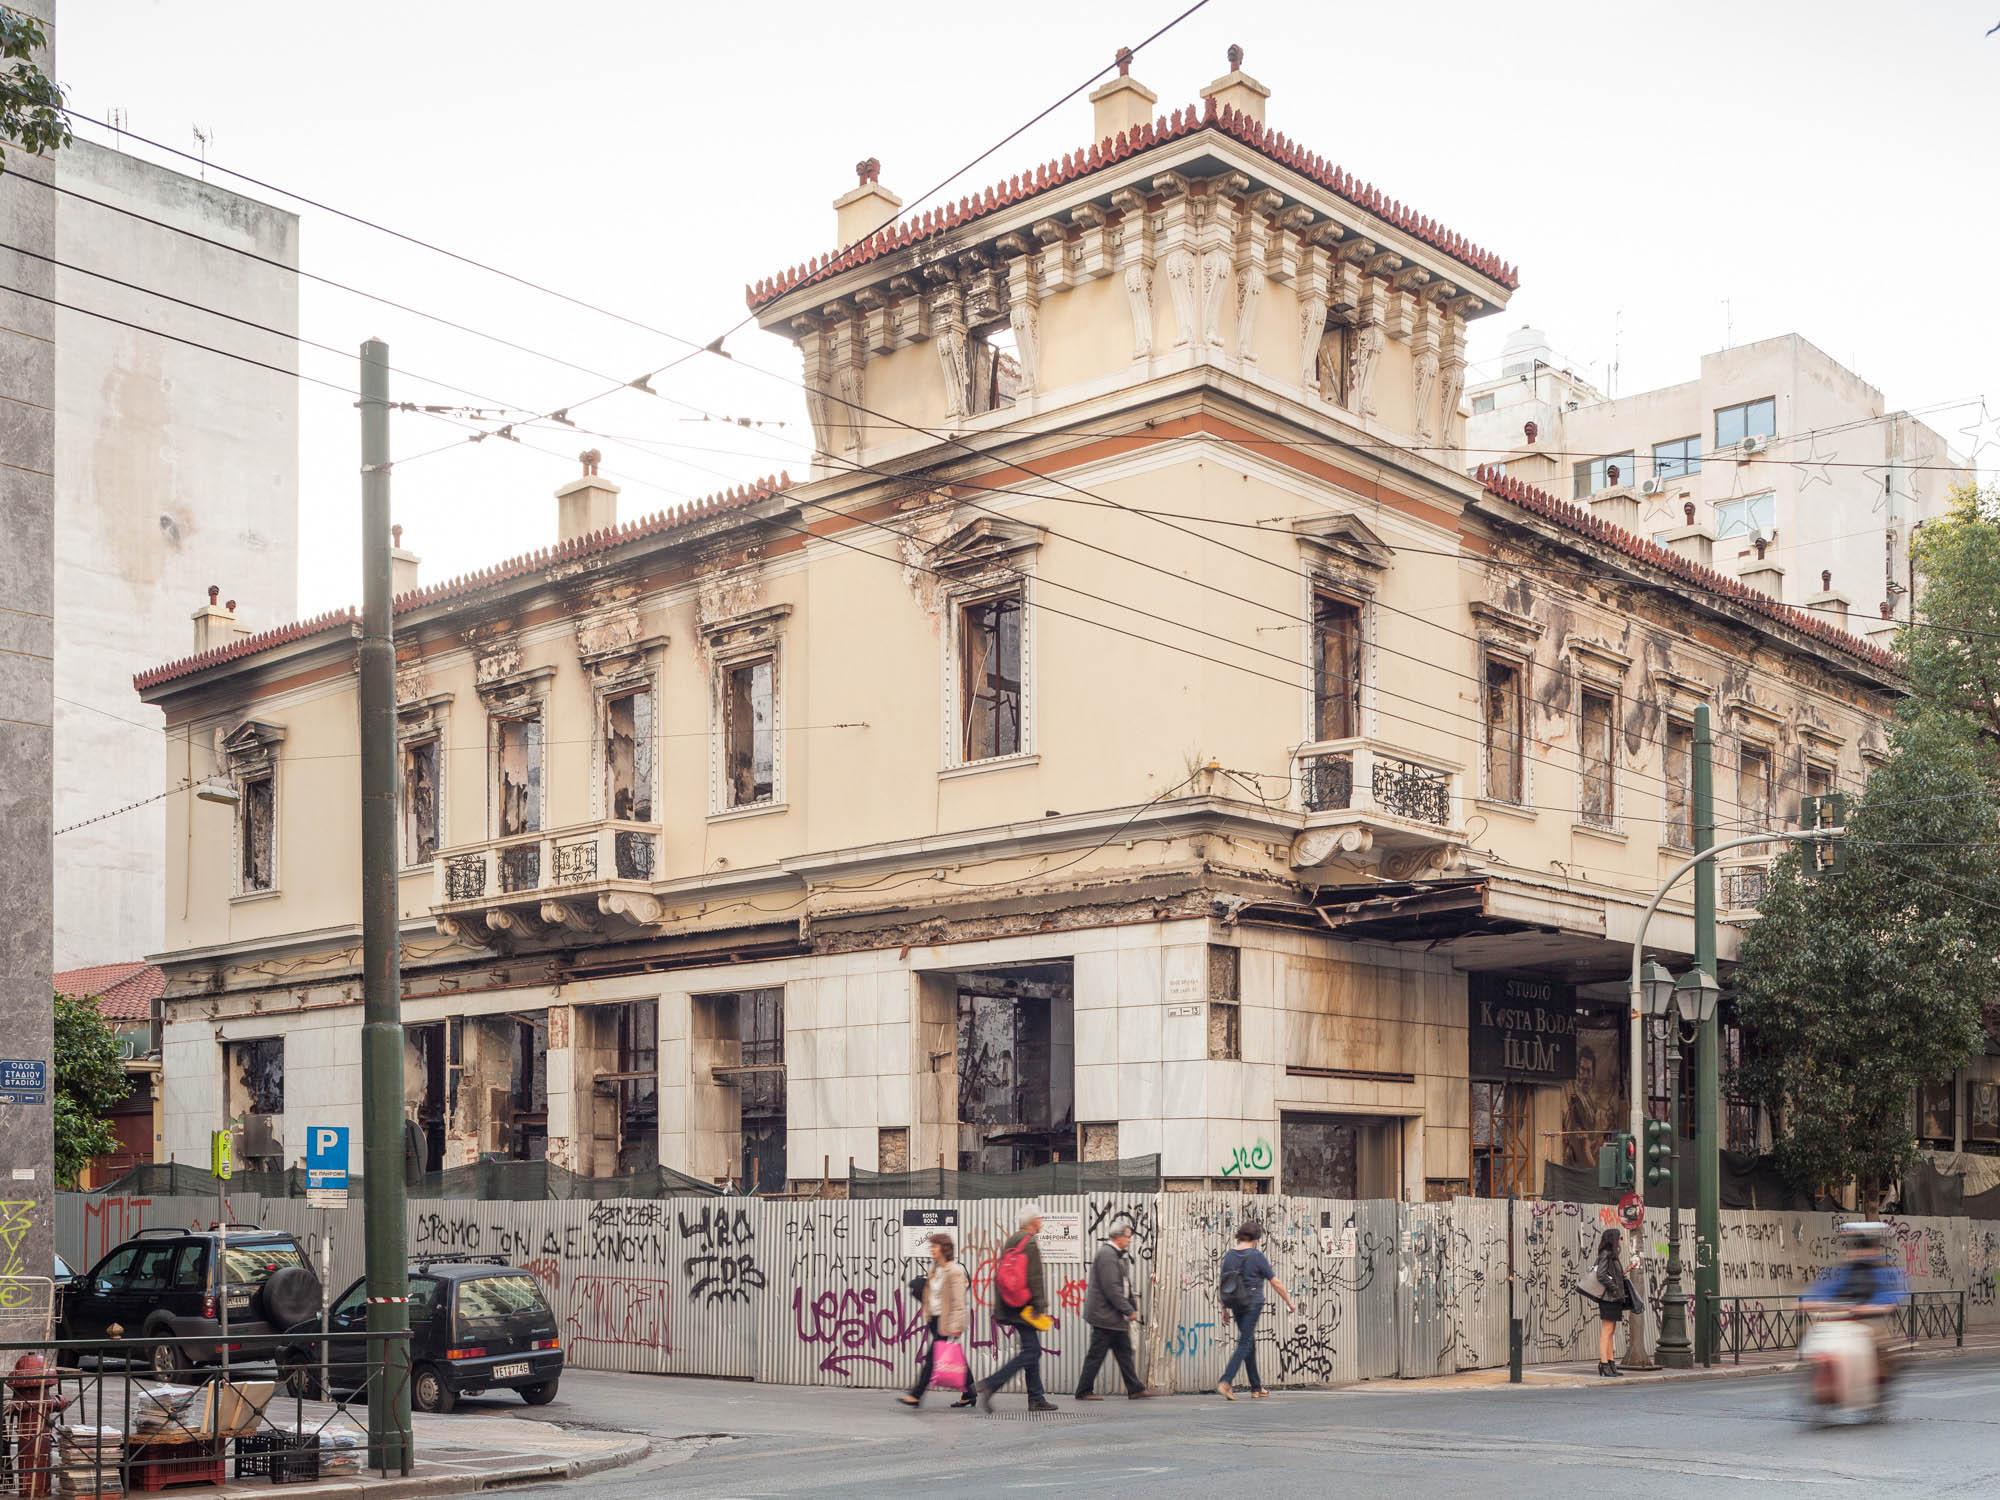 Athen-3413.jpg